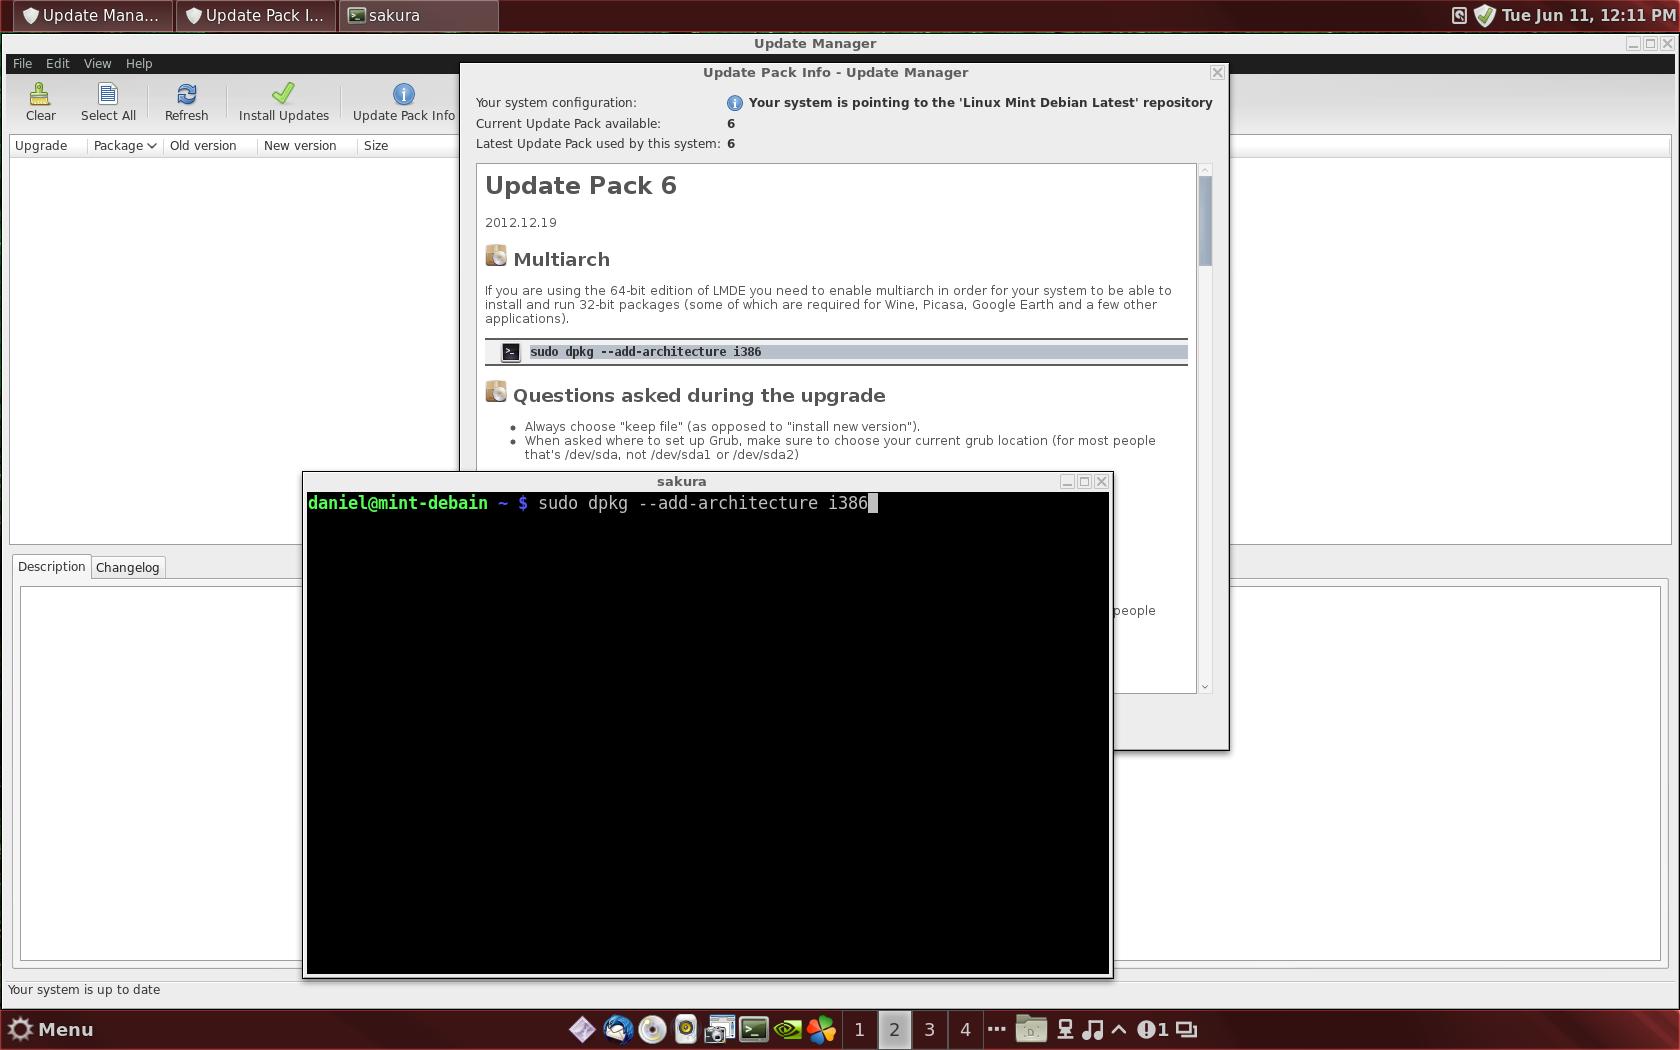 Need help installing 32bits OpenGL libraries in Mint Debain - AOA Forums